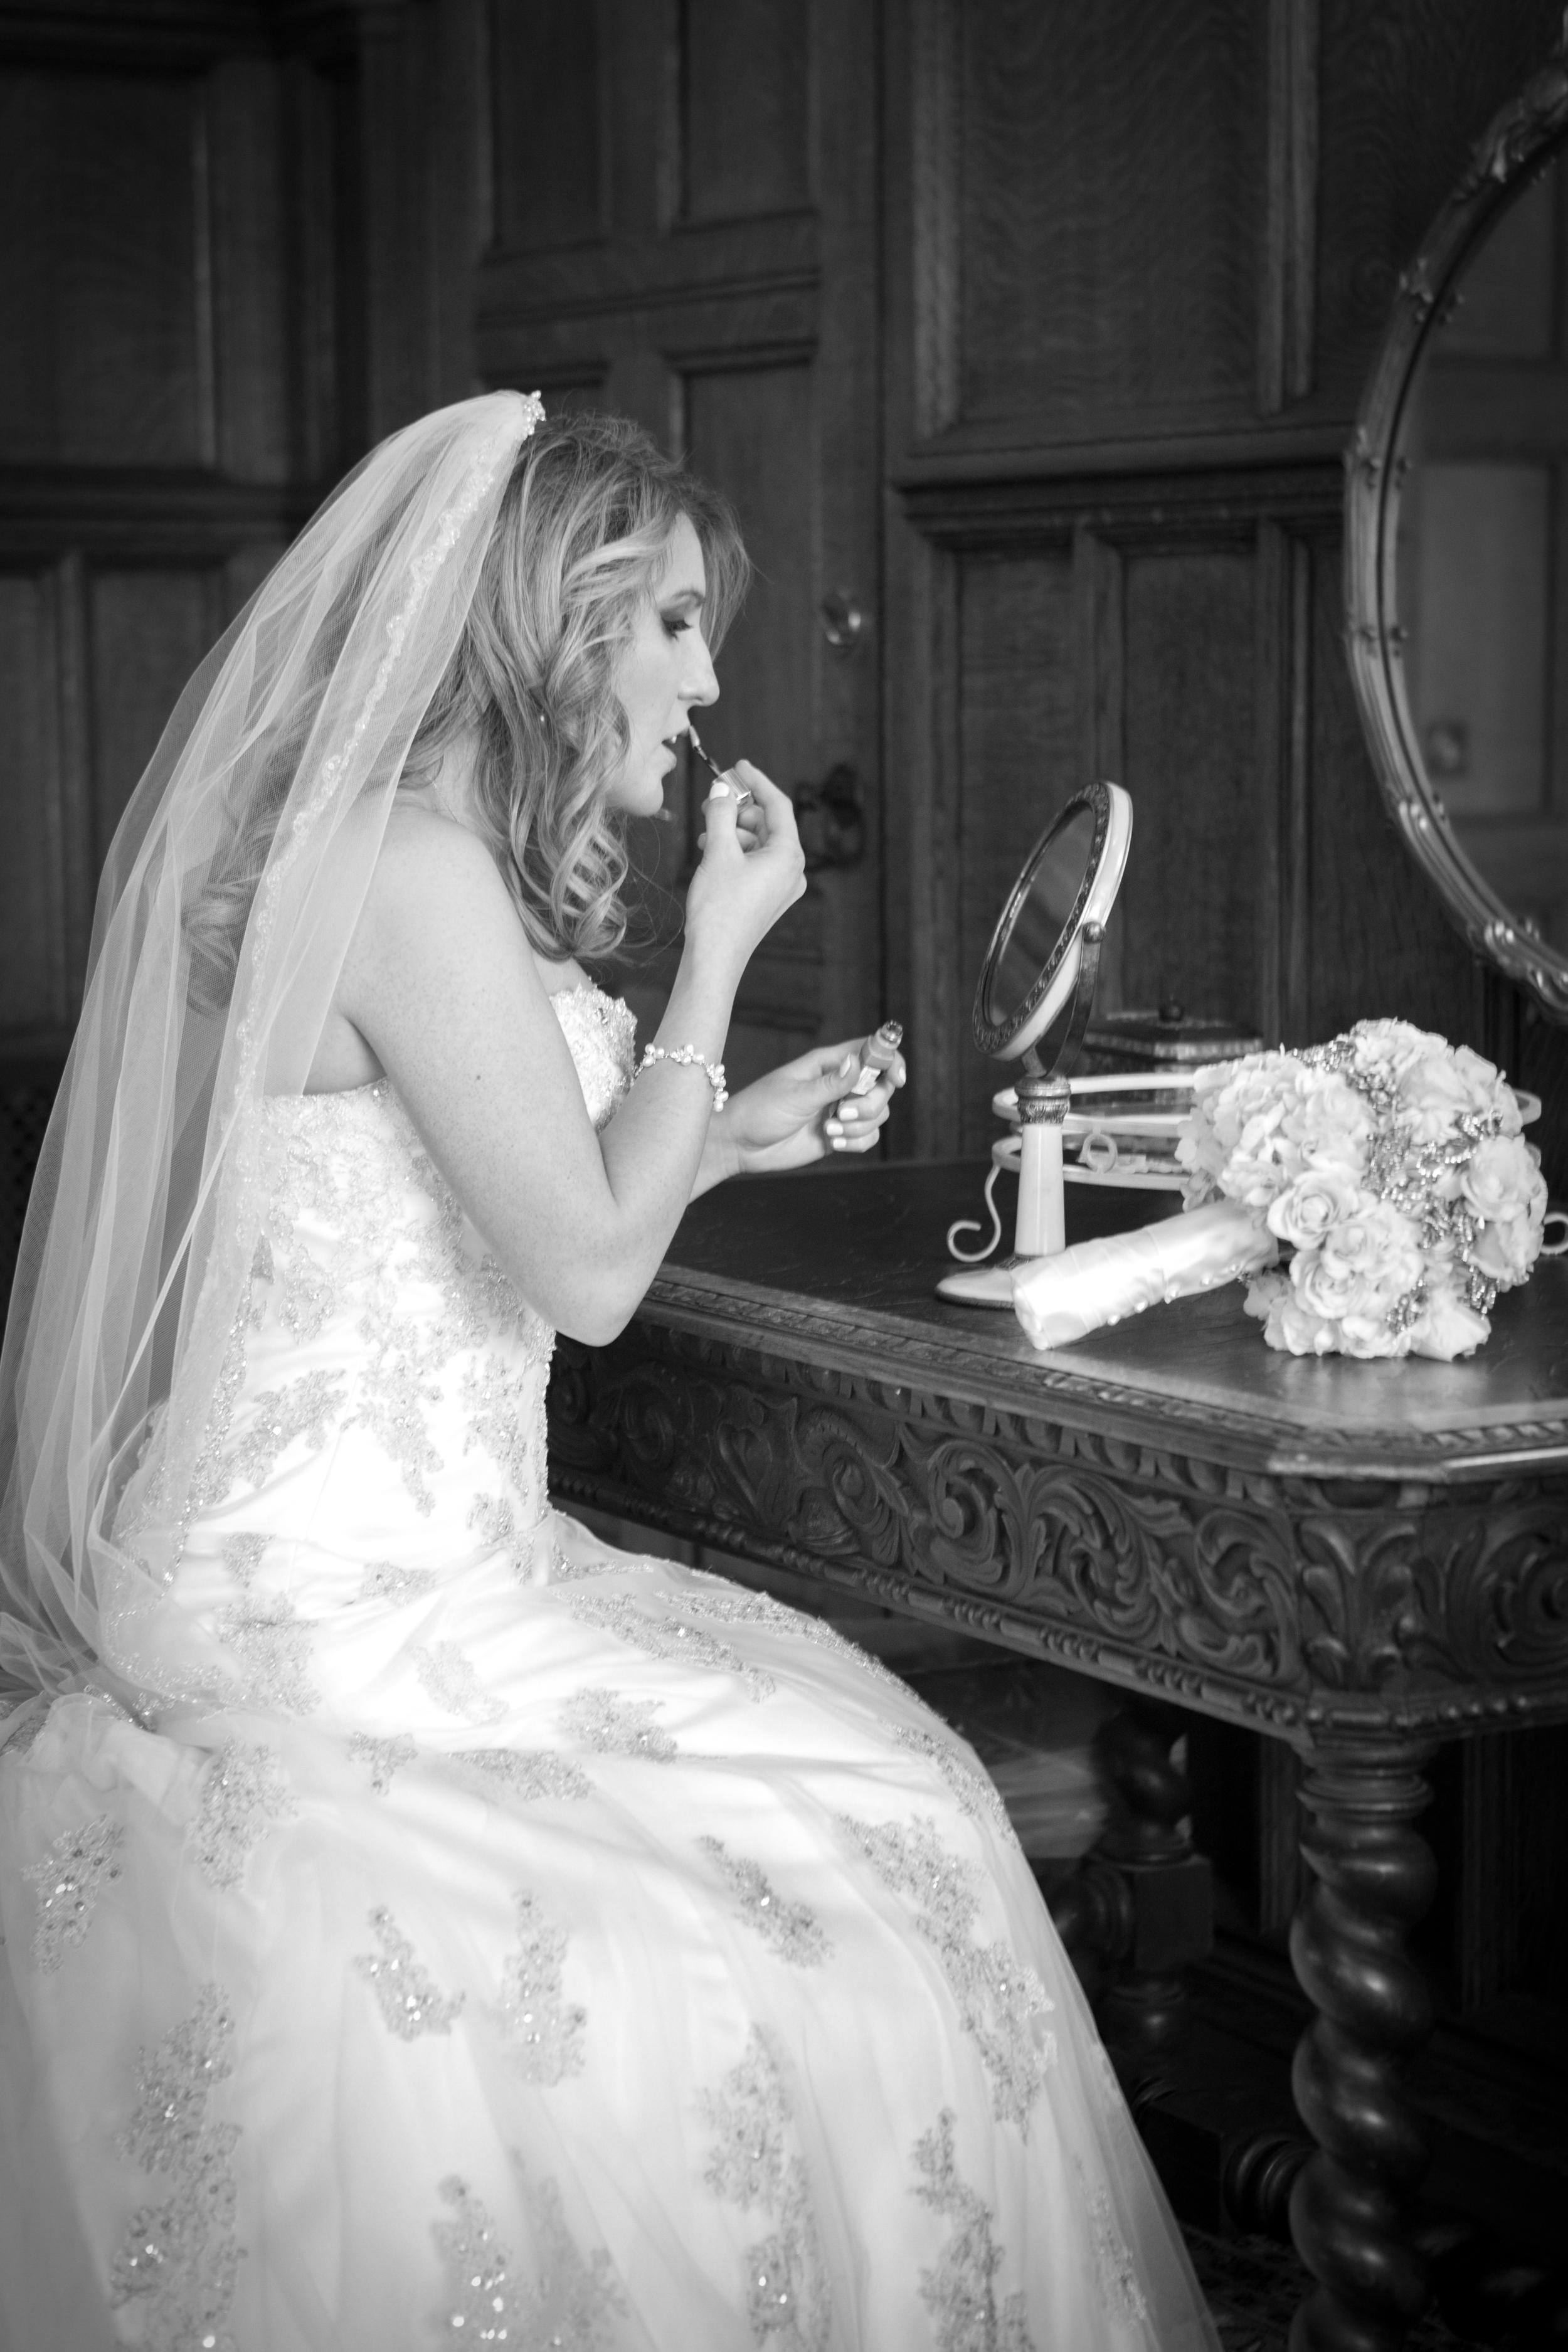 wedding bride wedding dress lipstick .jpg